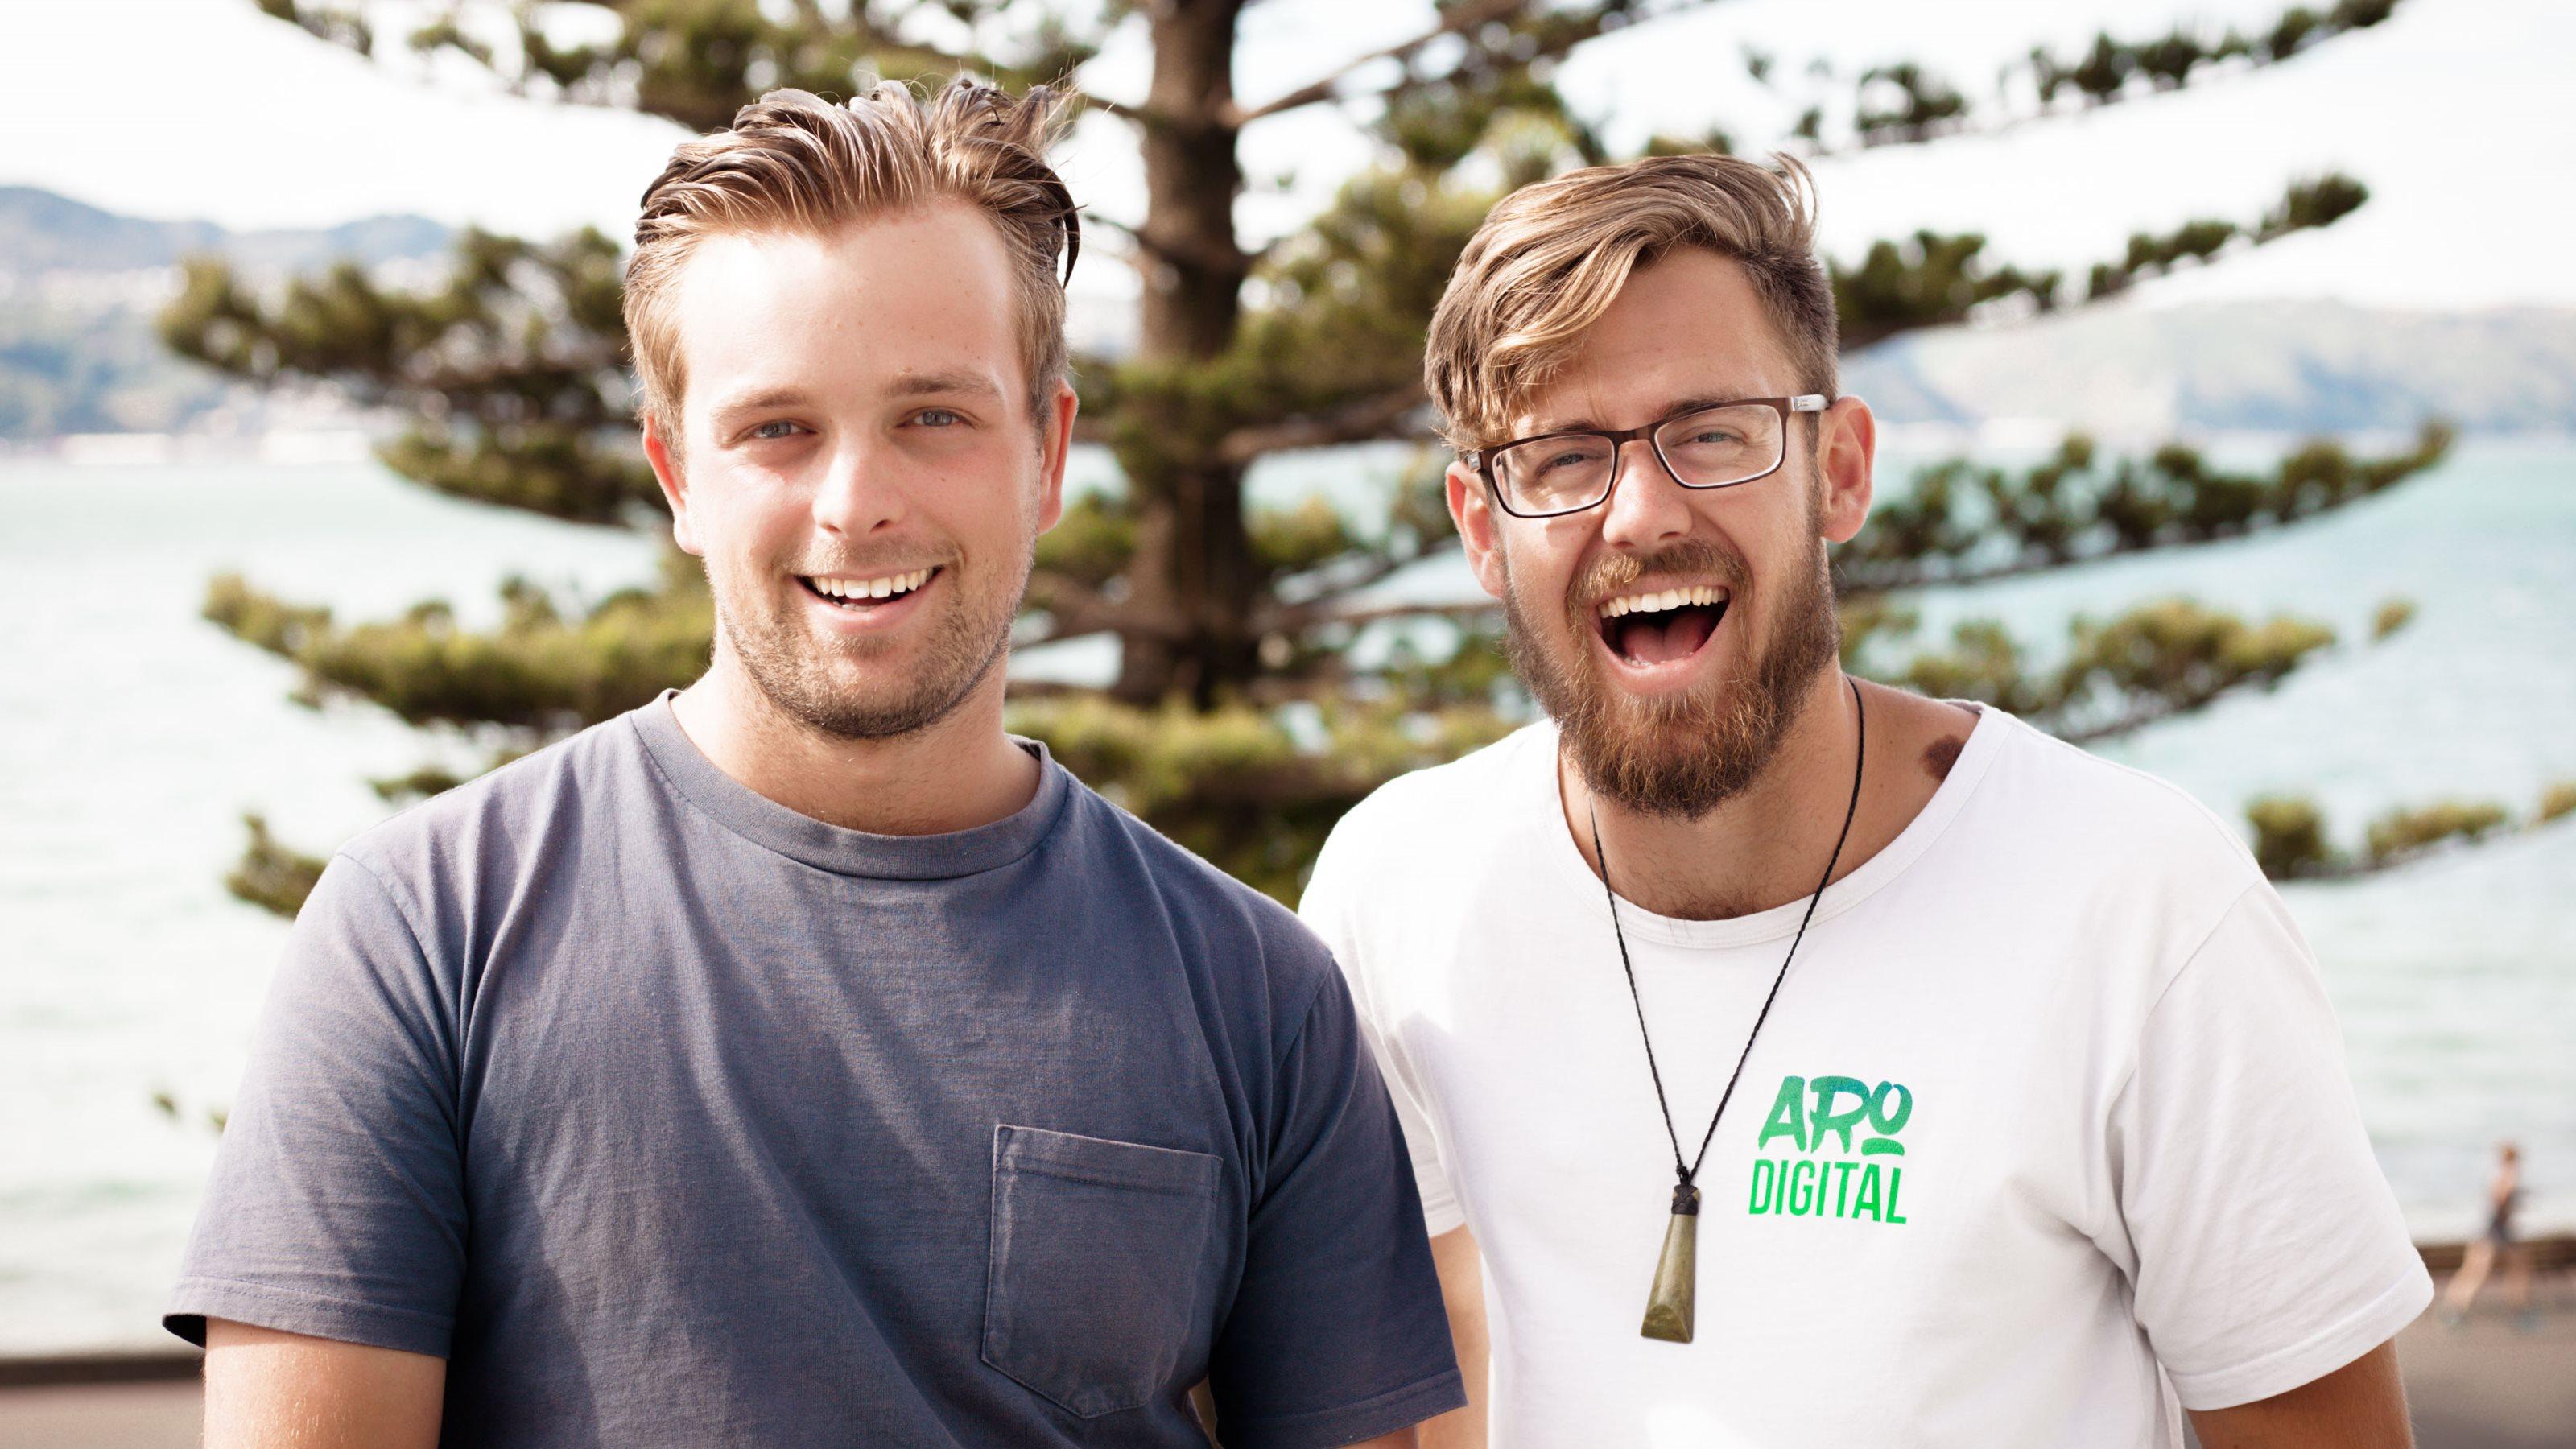 Jonty Hodge and Tim Dorrian from Aro Digital